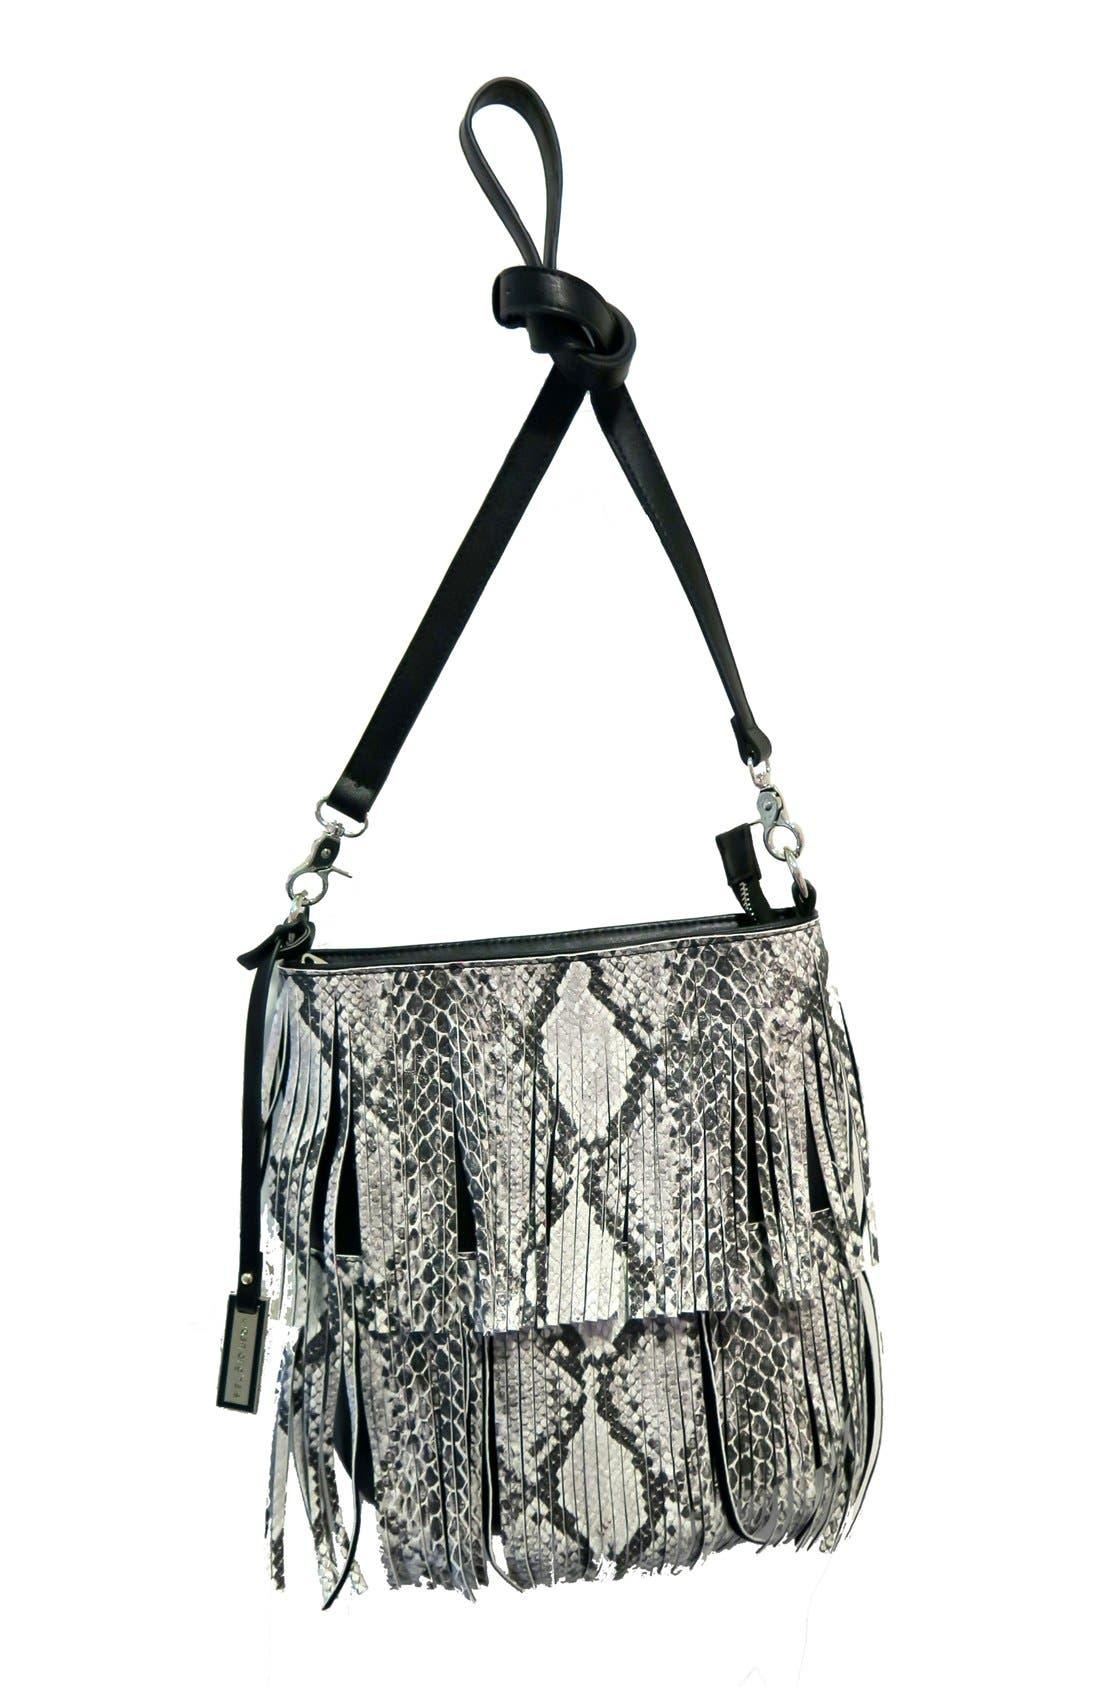 URBAN ORIGINALS Burning Up Fringe Convertible Vegan Leather Crossbody Bag